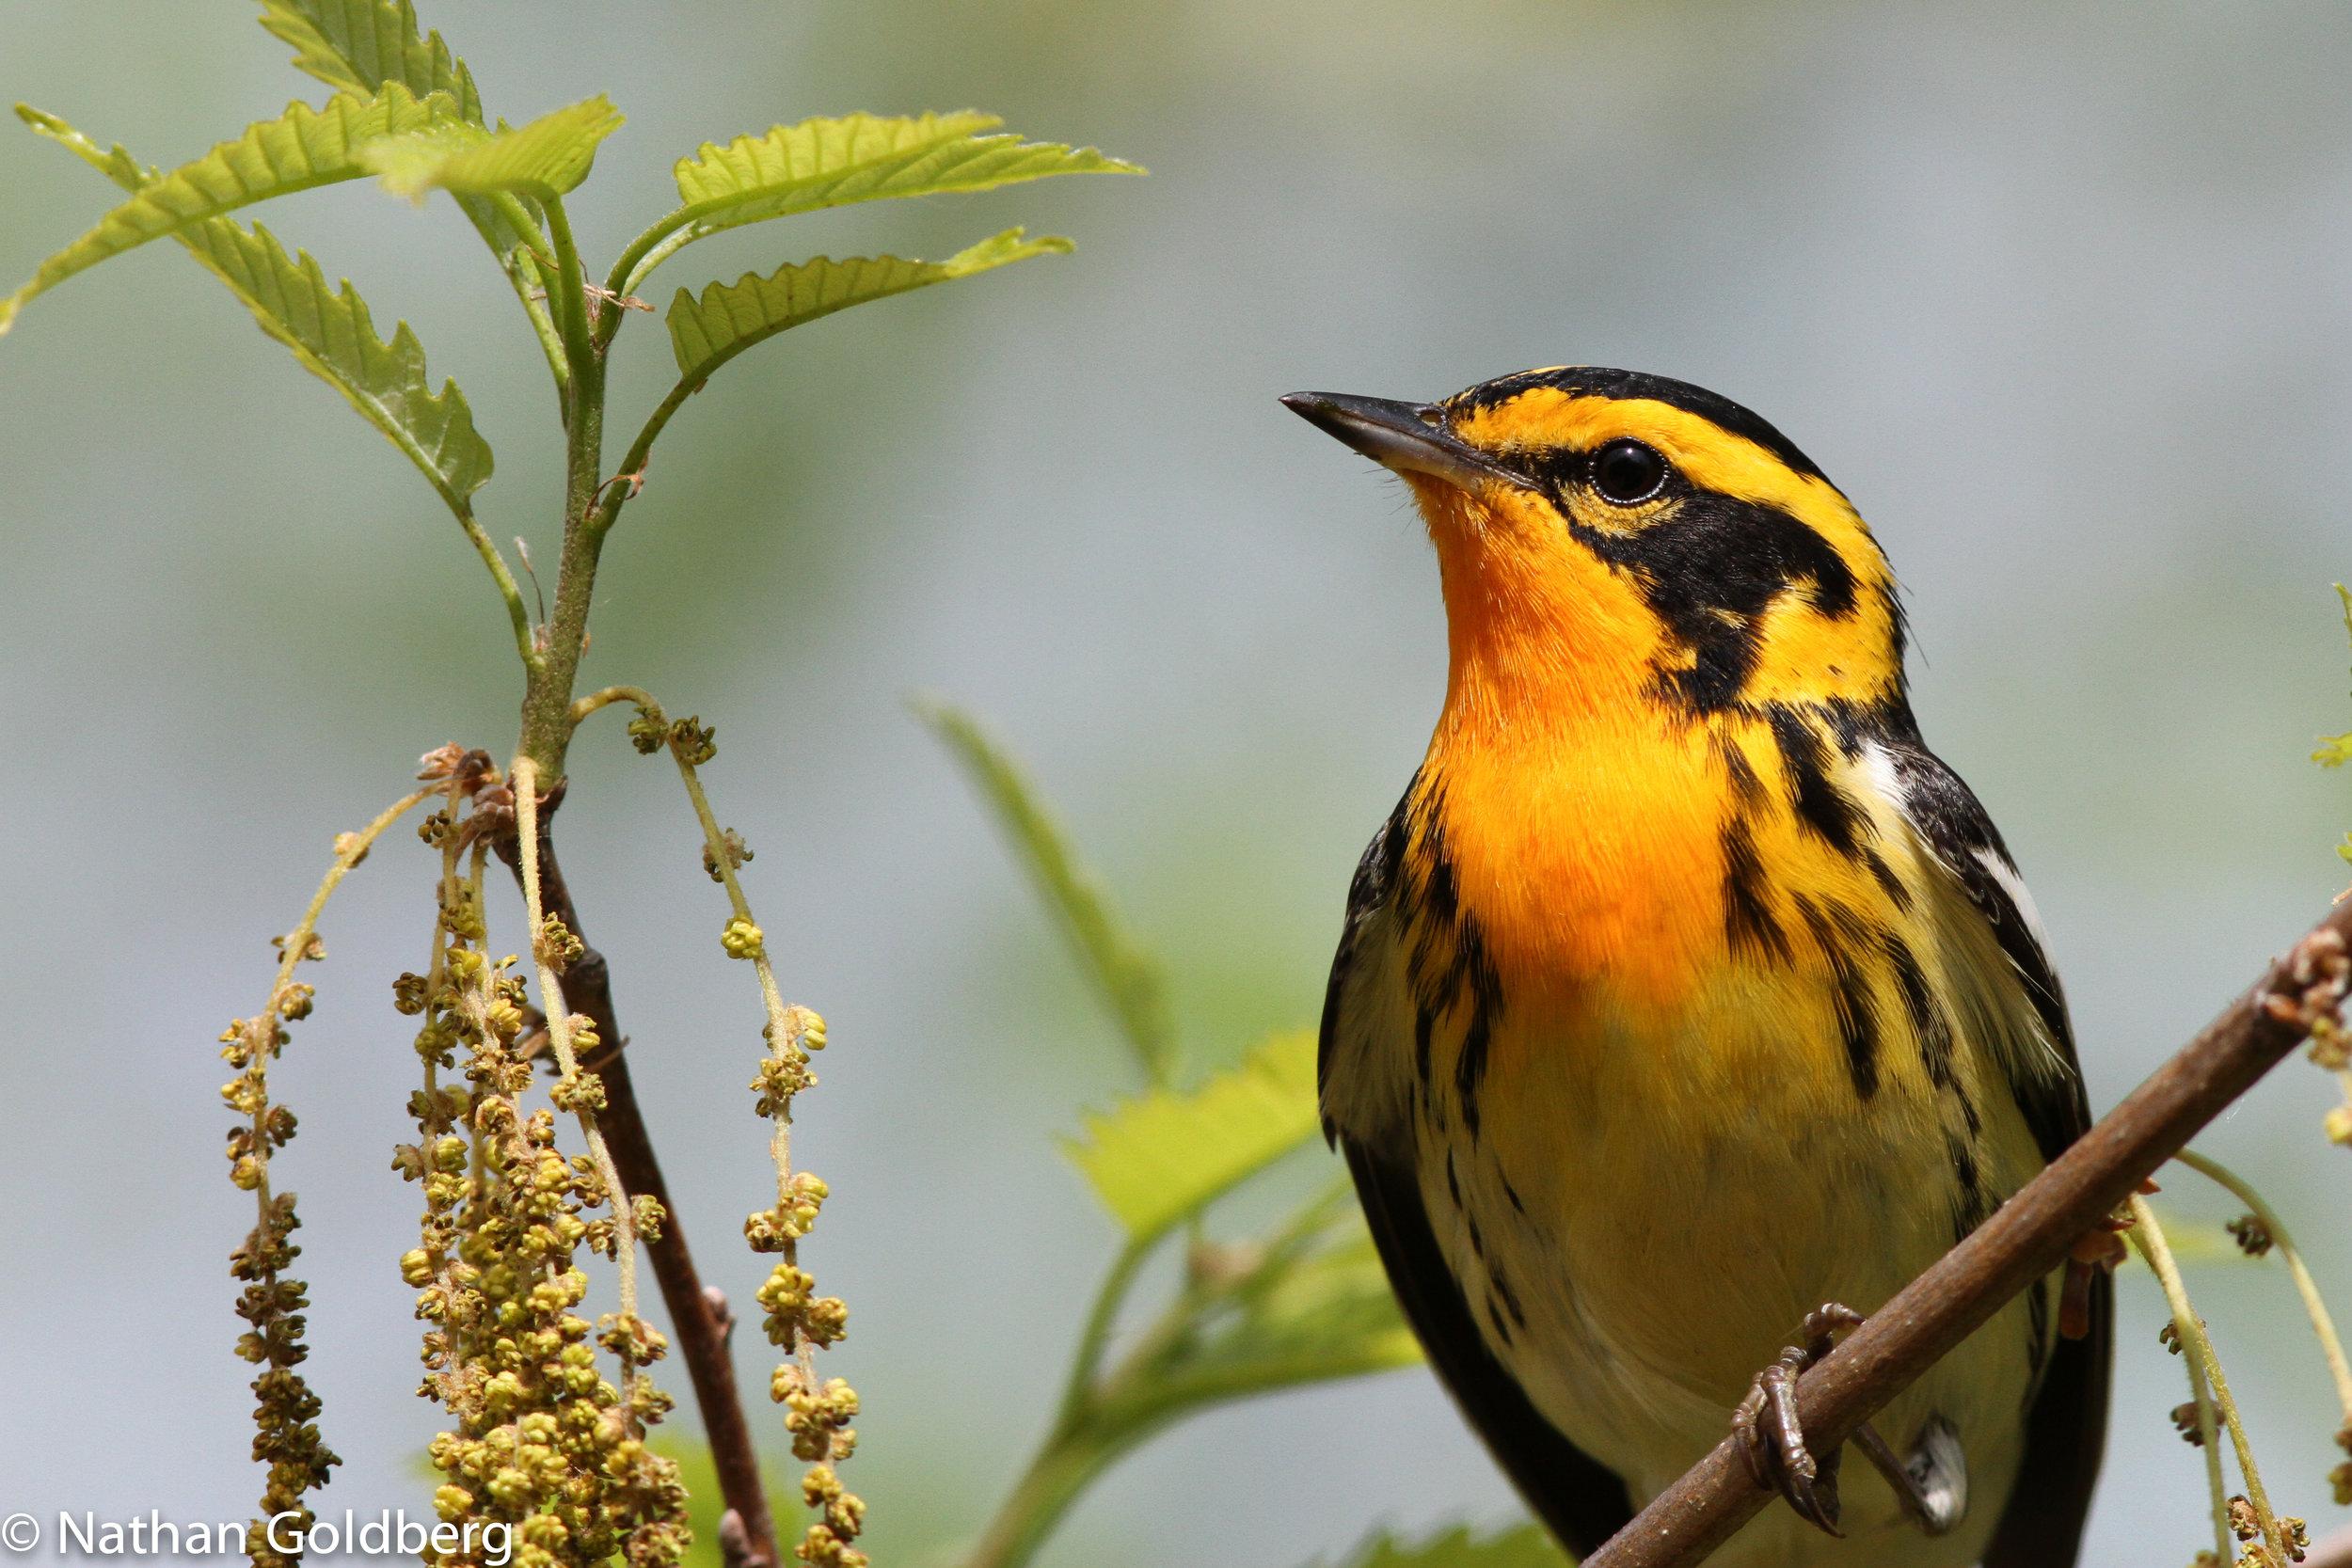 Blackburnian Warbler - photo by Nathan Goldberg